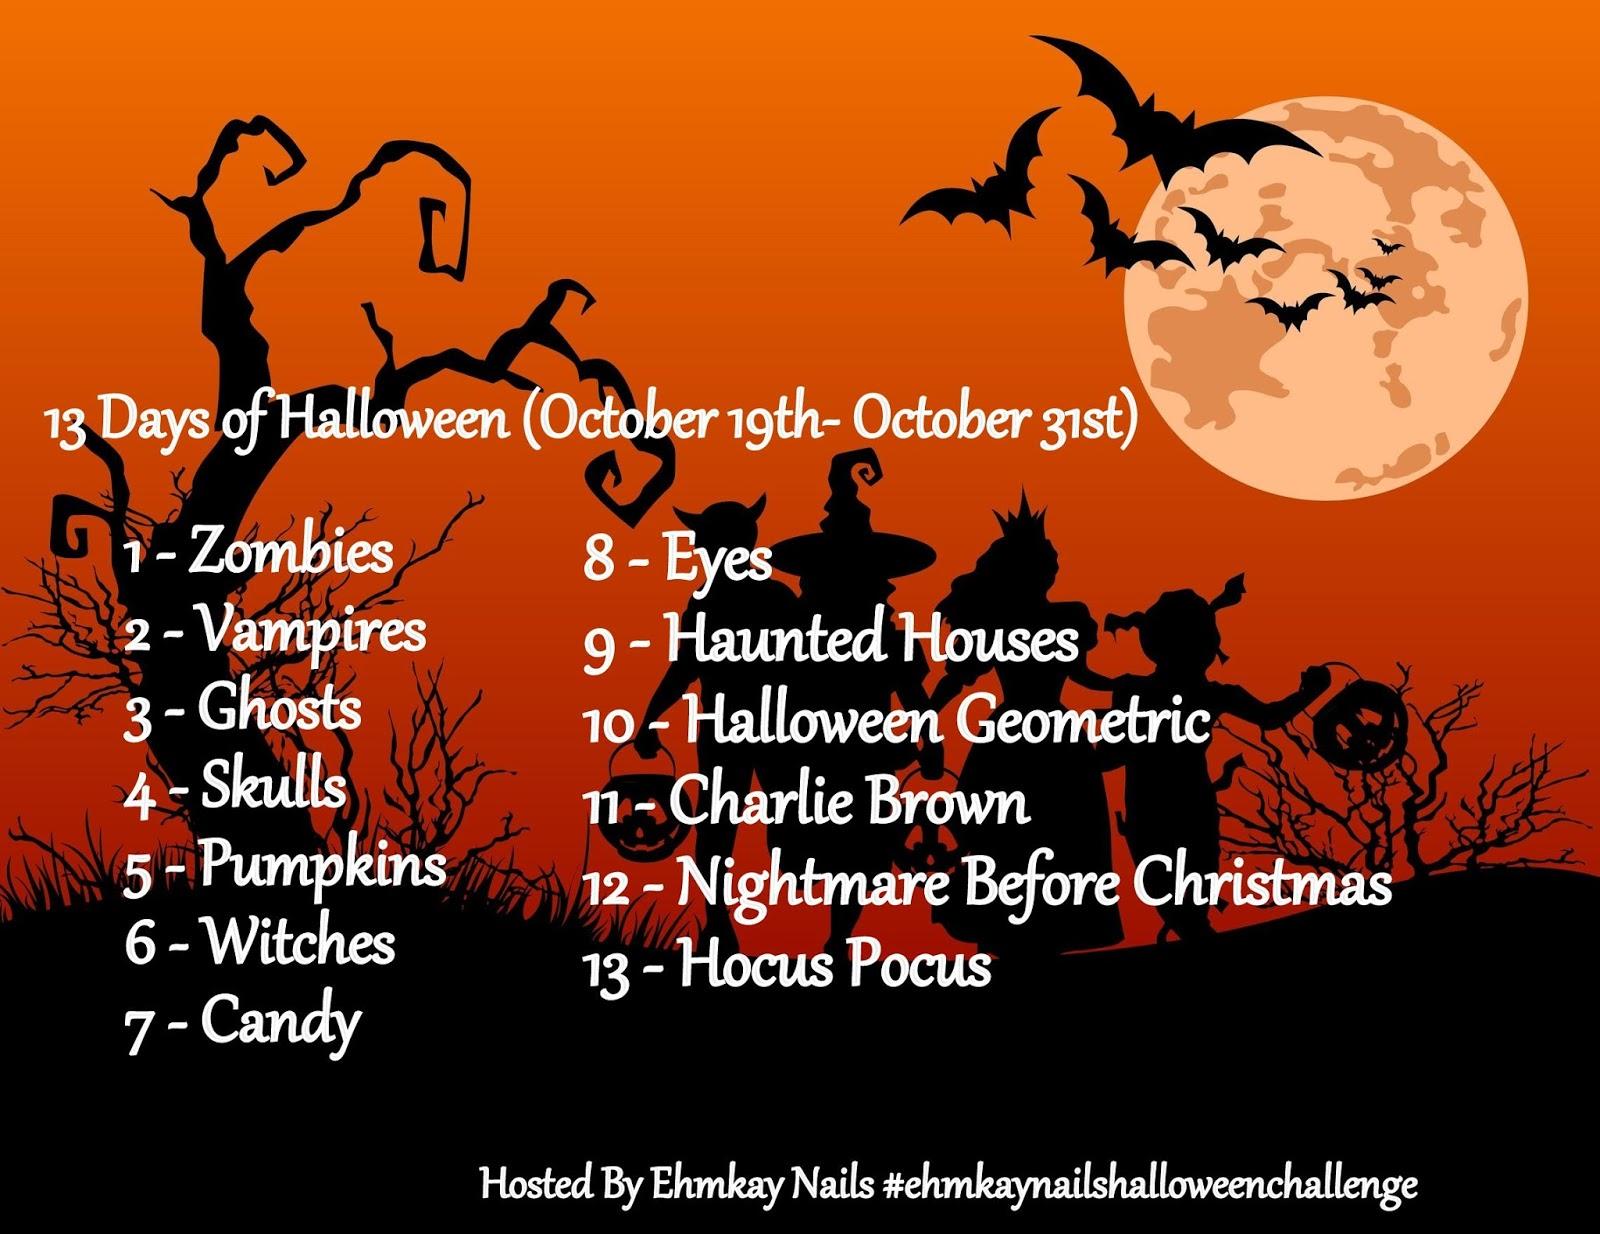 ehmkay nails: 13 Days of Halloween Nail Art: Pumpkin Stamping